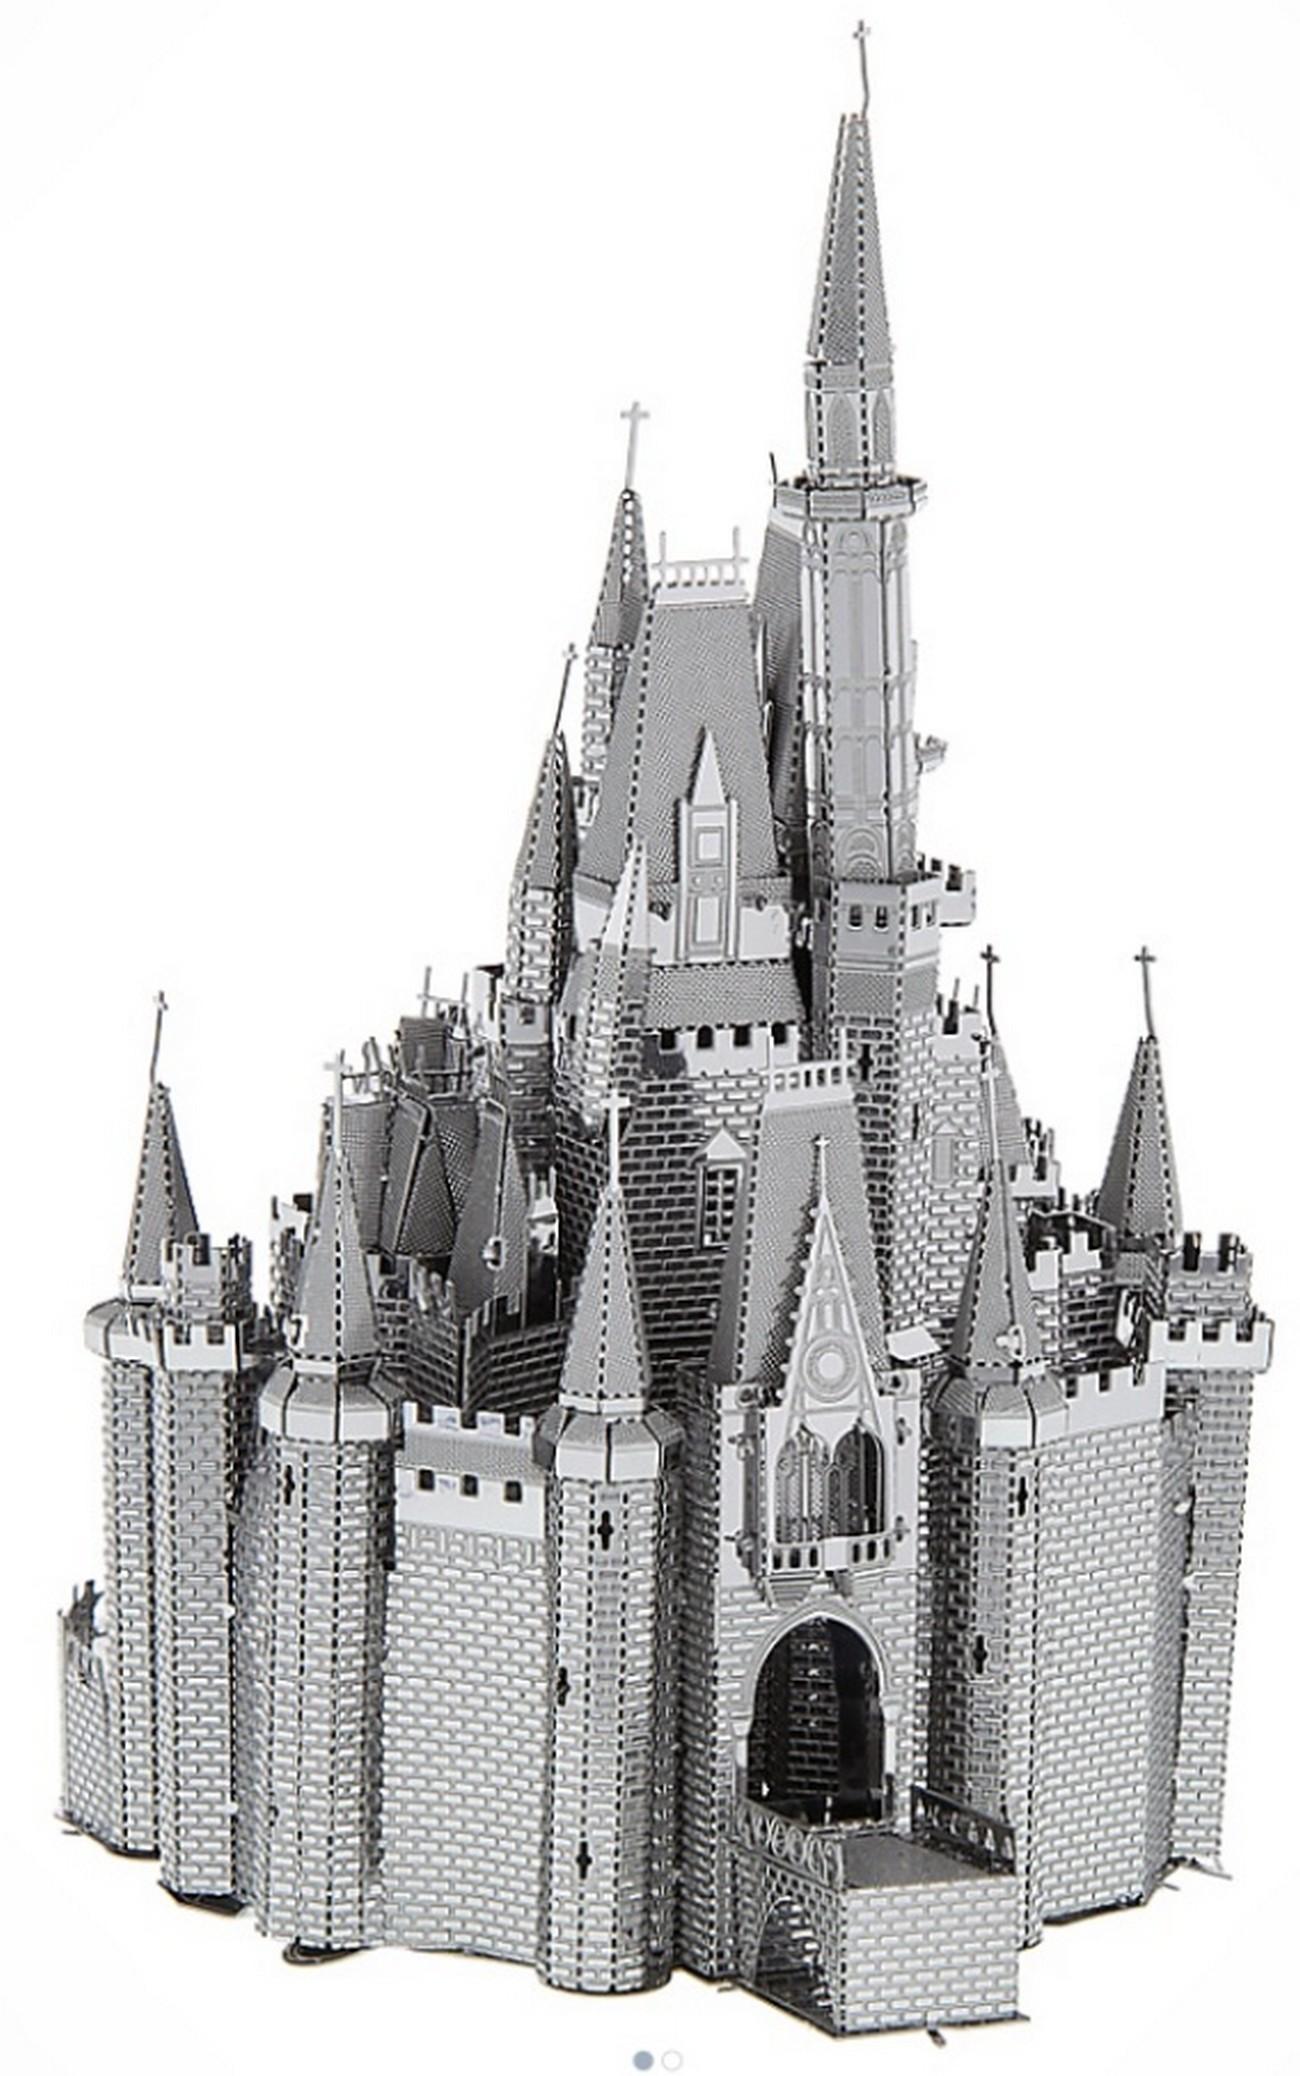 Walt Disney World Cinderella's Castle 3D Metal Model Kit - Disney Exclusive © Dizdude.com